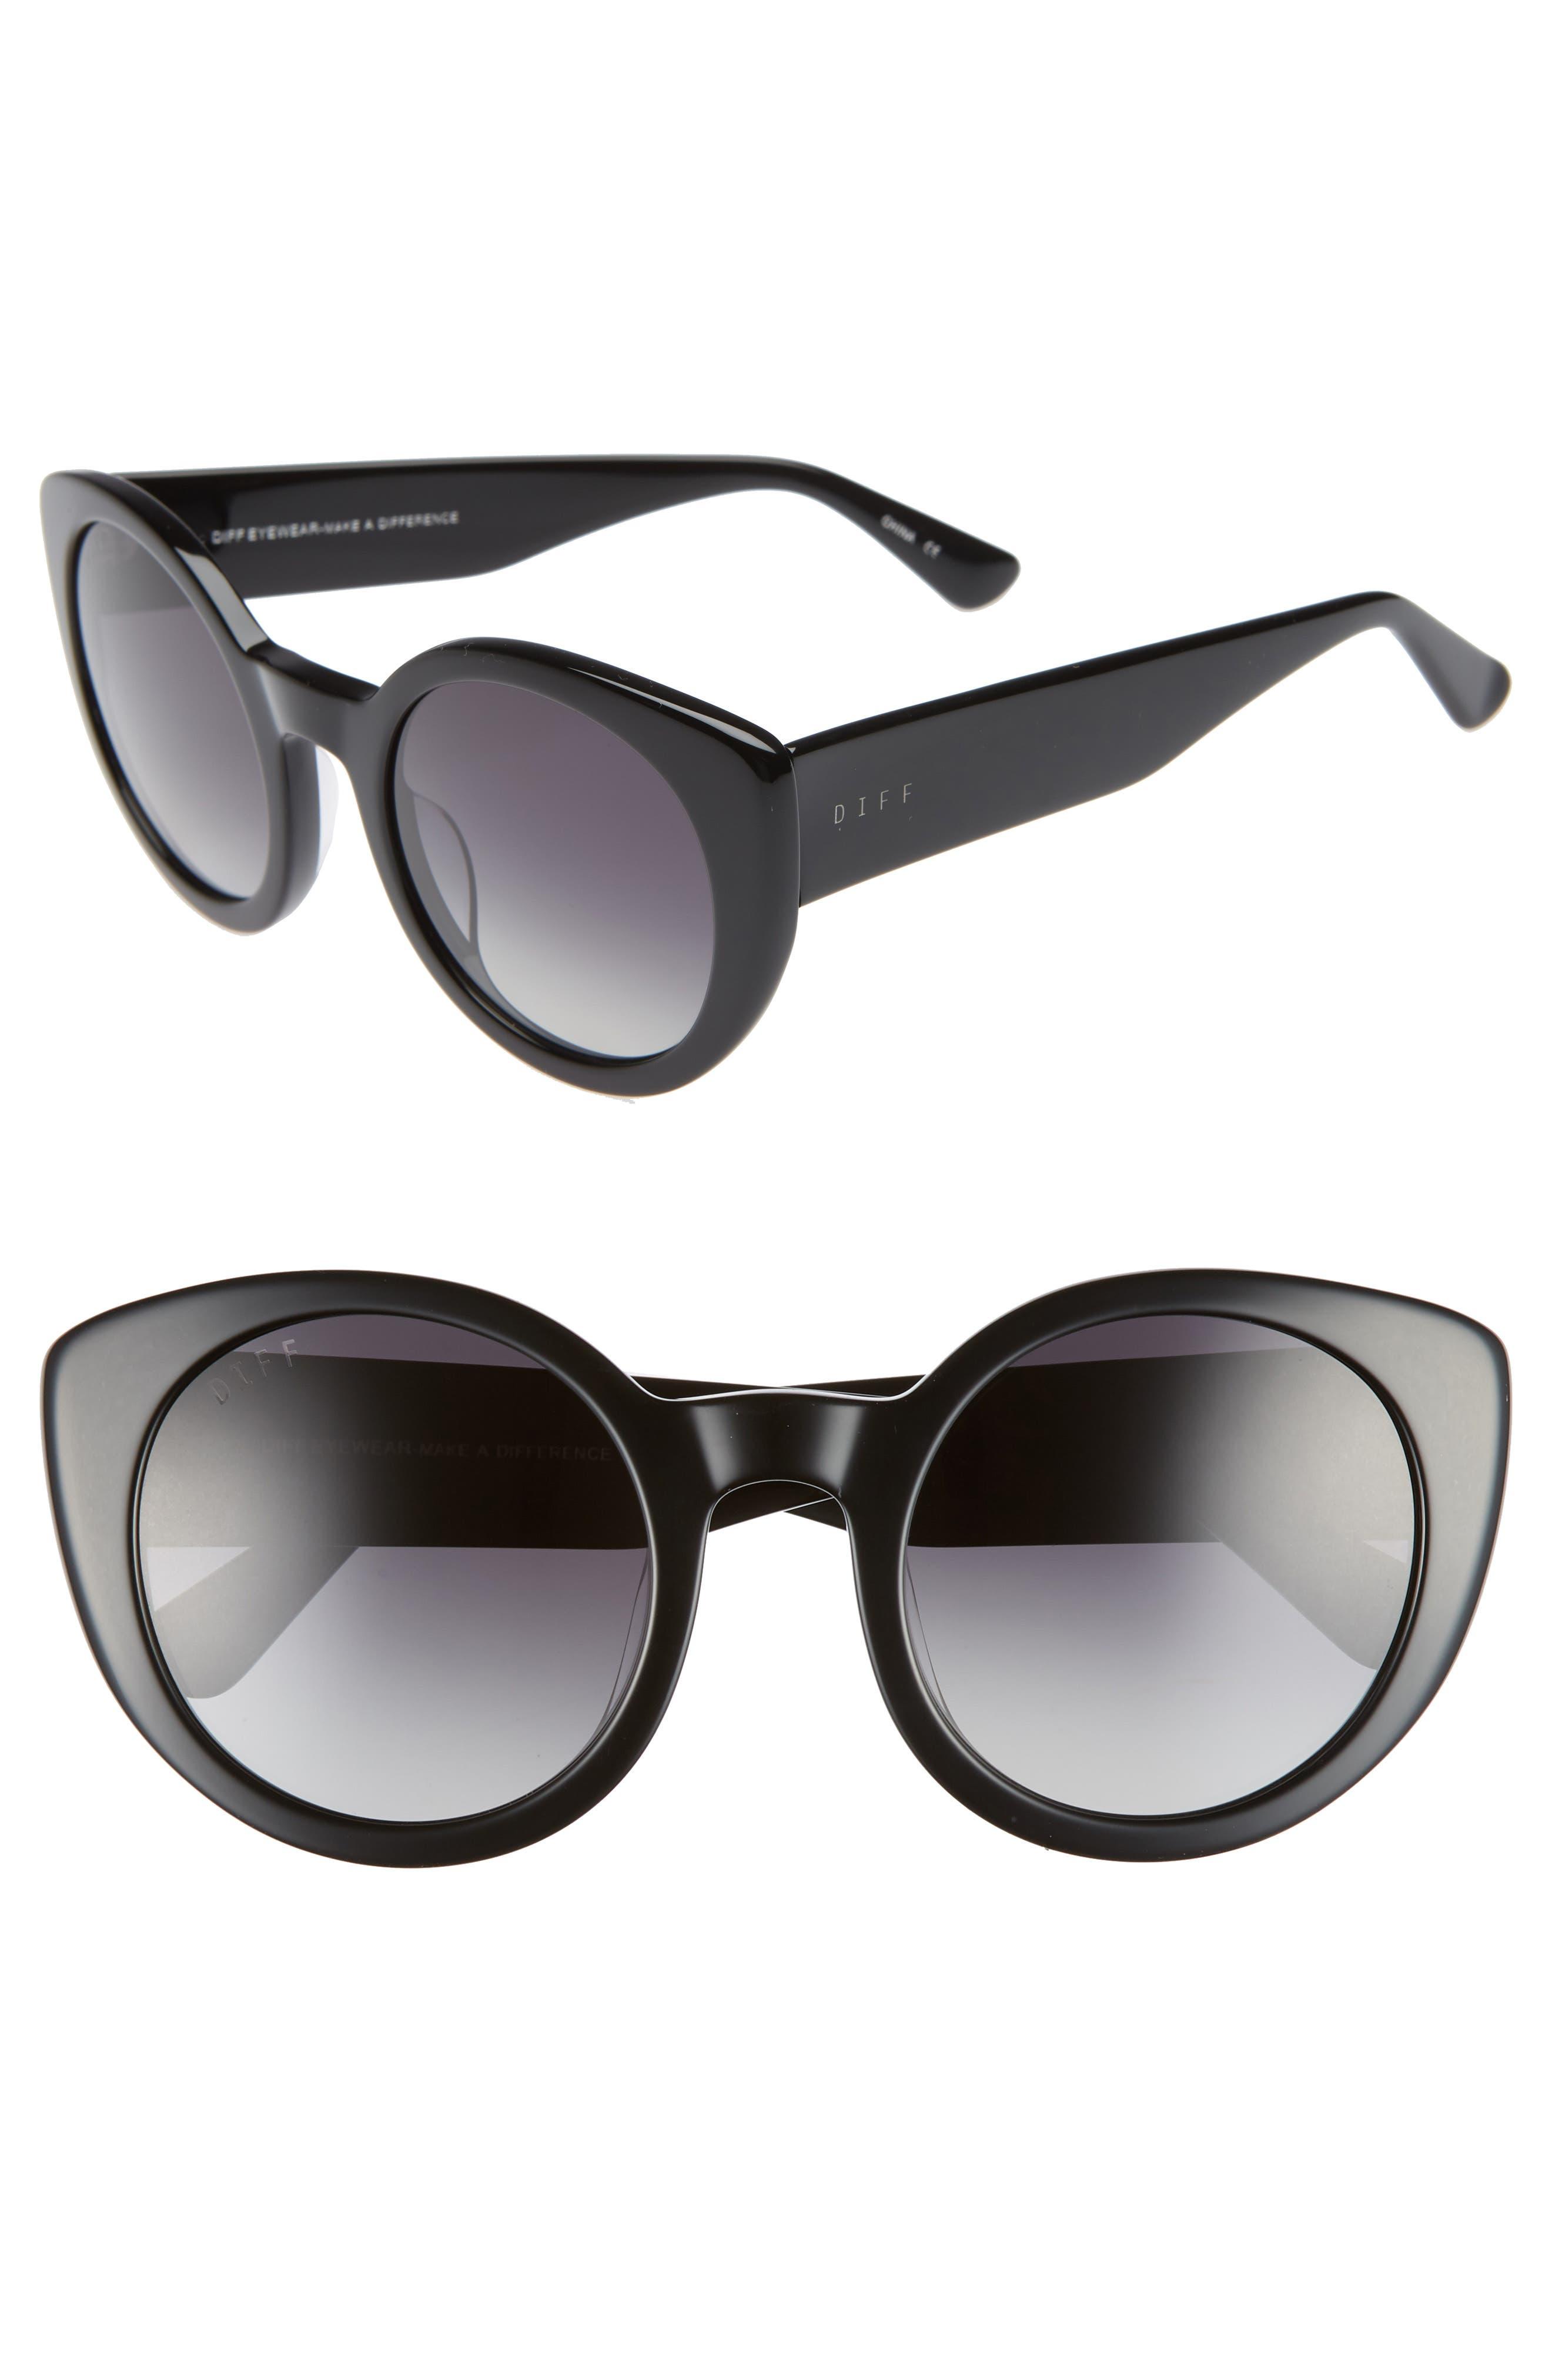 Luna 54mm Polarized Round Sunglasses,                             Main thumbnail 1, color,                             BLACK/ GREY